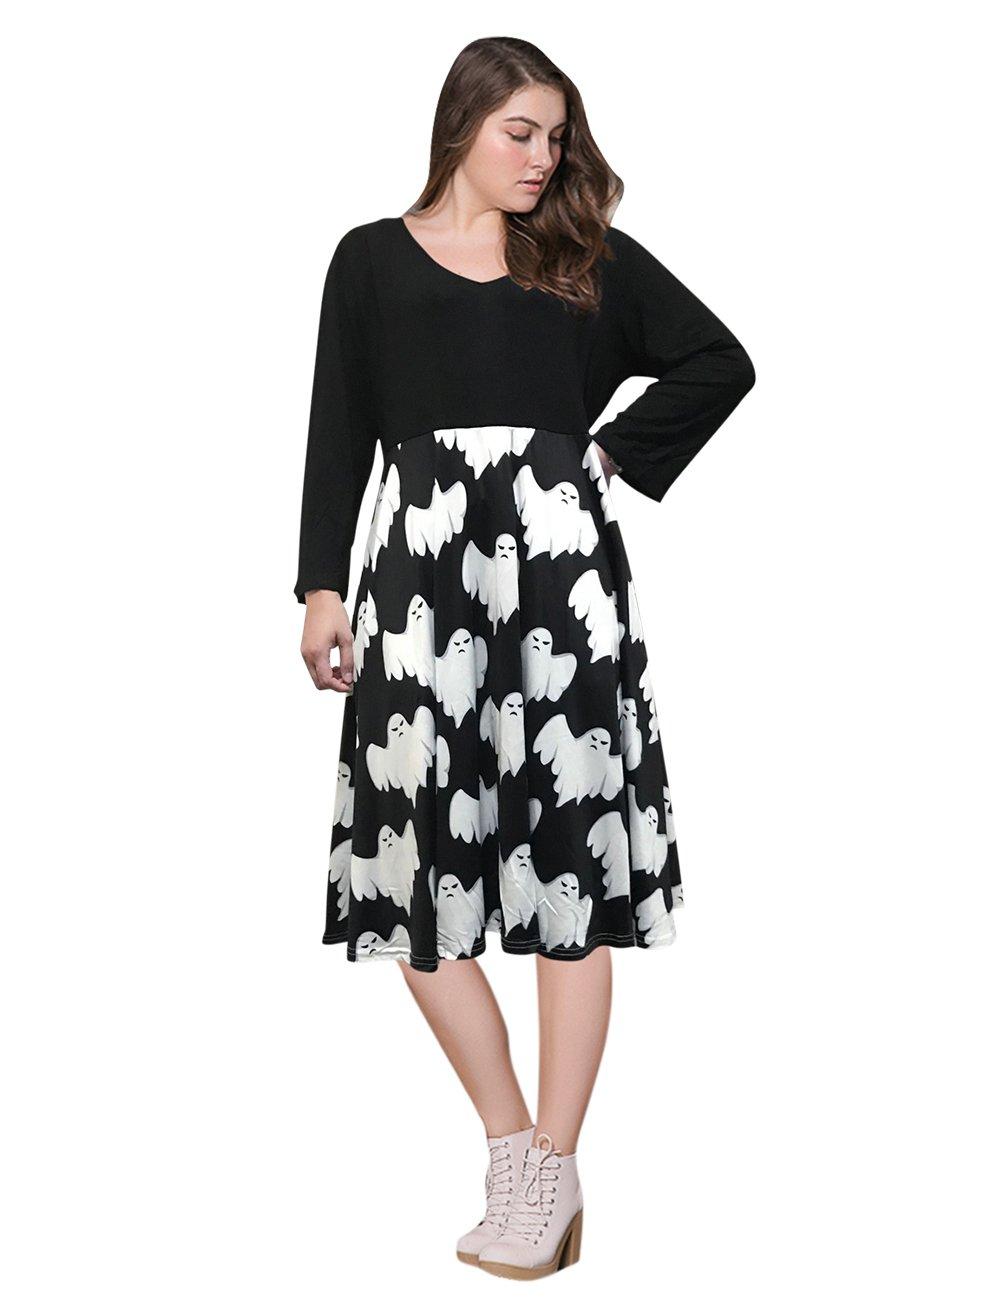 AMZ PLUS Women Plus Size 3/4 Sleeve Swing Party Casual Dresses Black 2XL